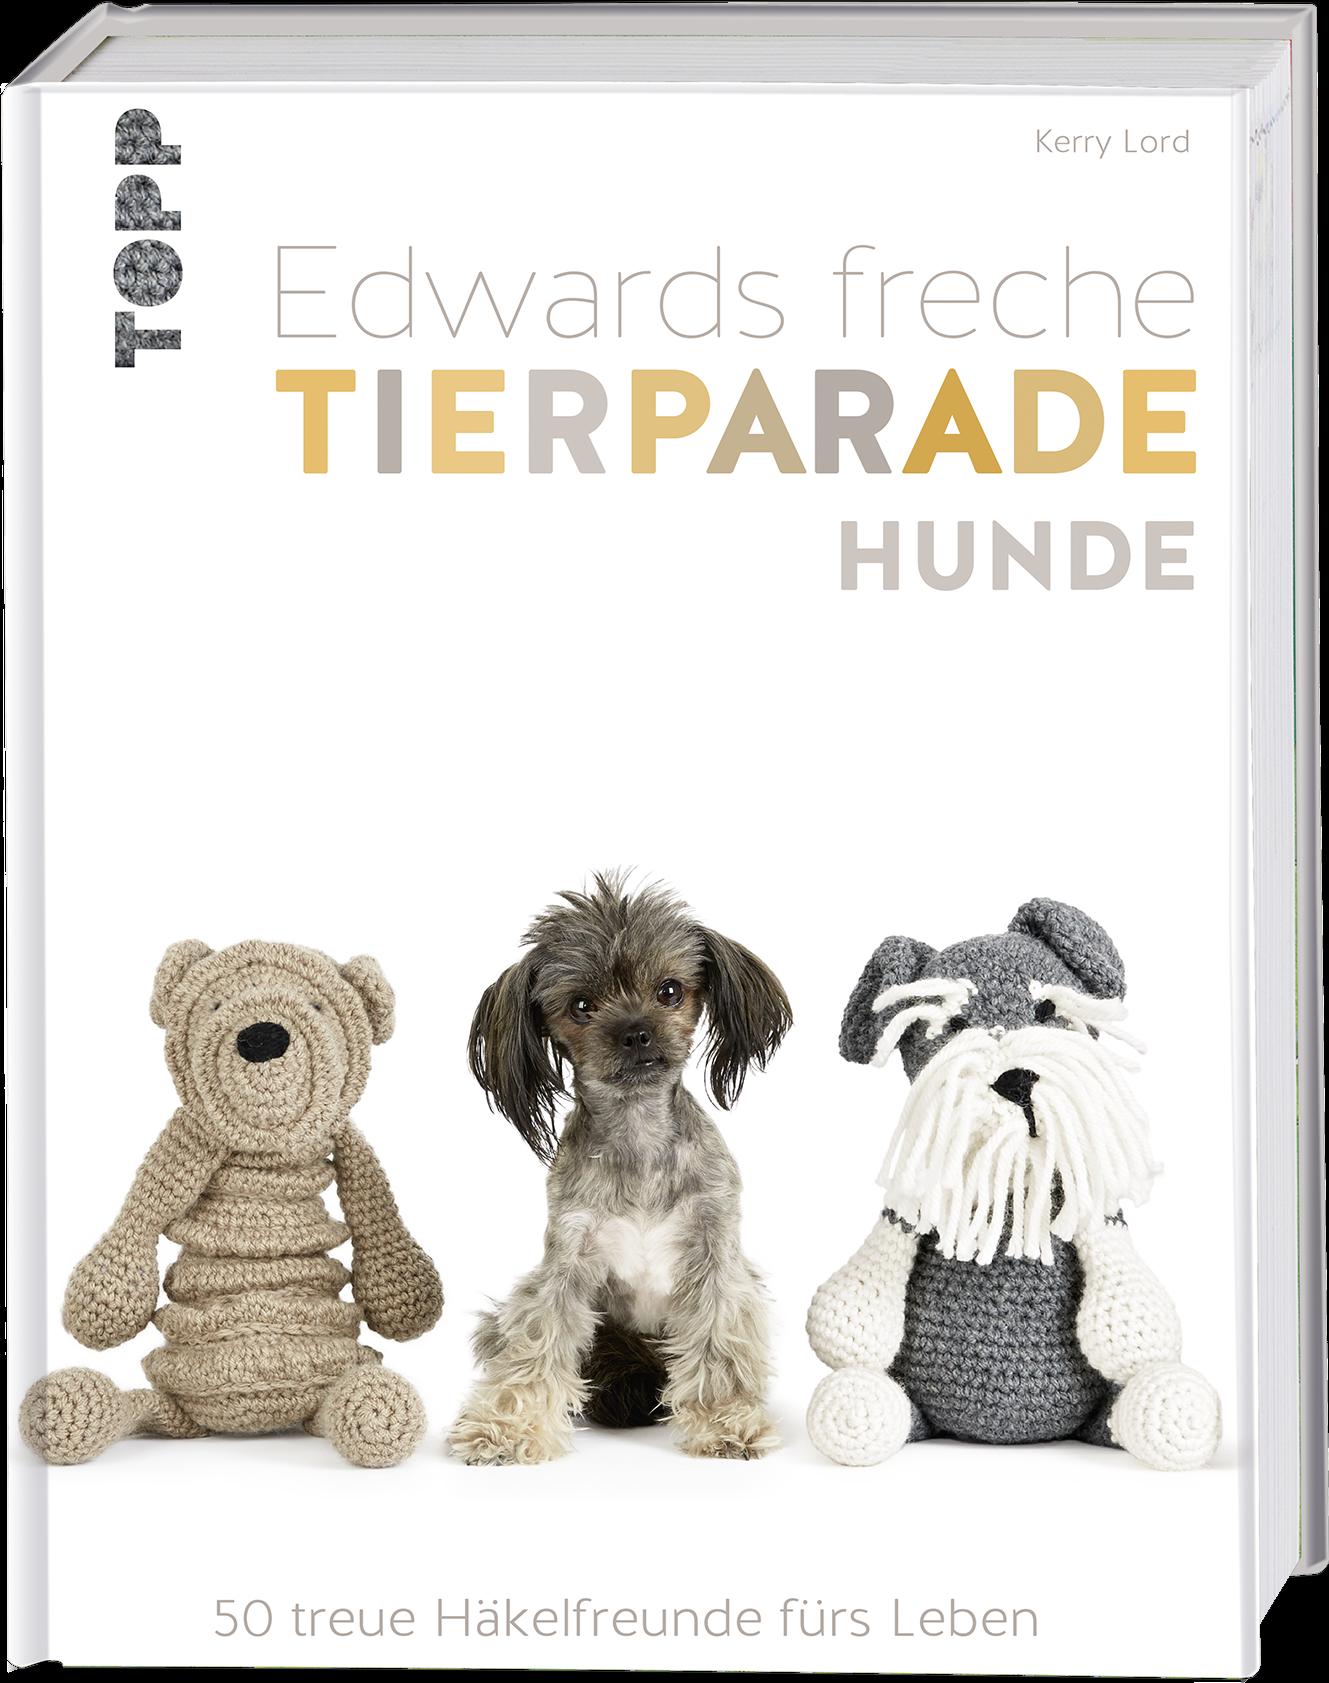 Edwards Freche Tierparade Hunde Häkeln Topp Kreativde